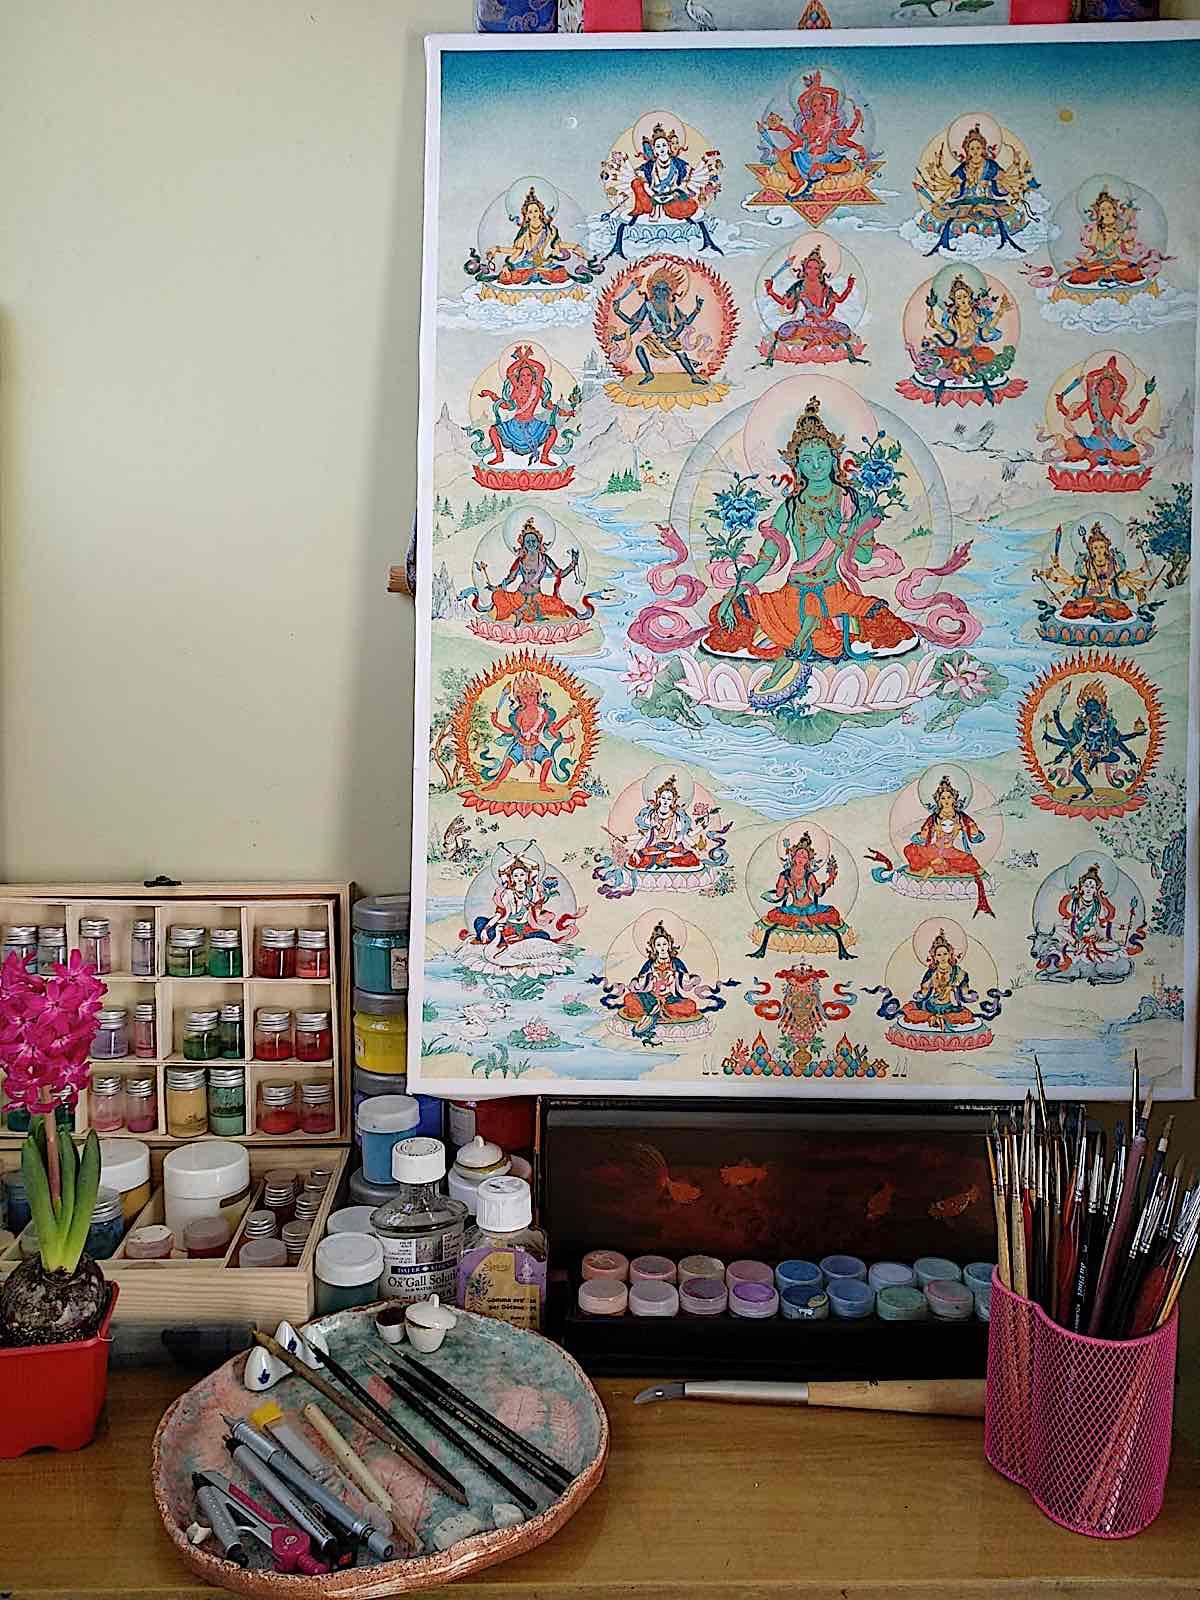 Buddha Weekly Angeli Lhadripa Shkonda workplace for painting thangkas 21 Taras featured Buddhism